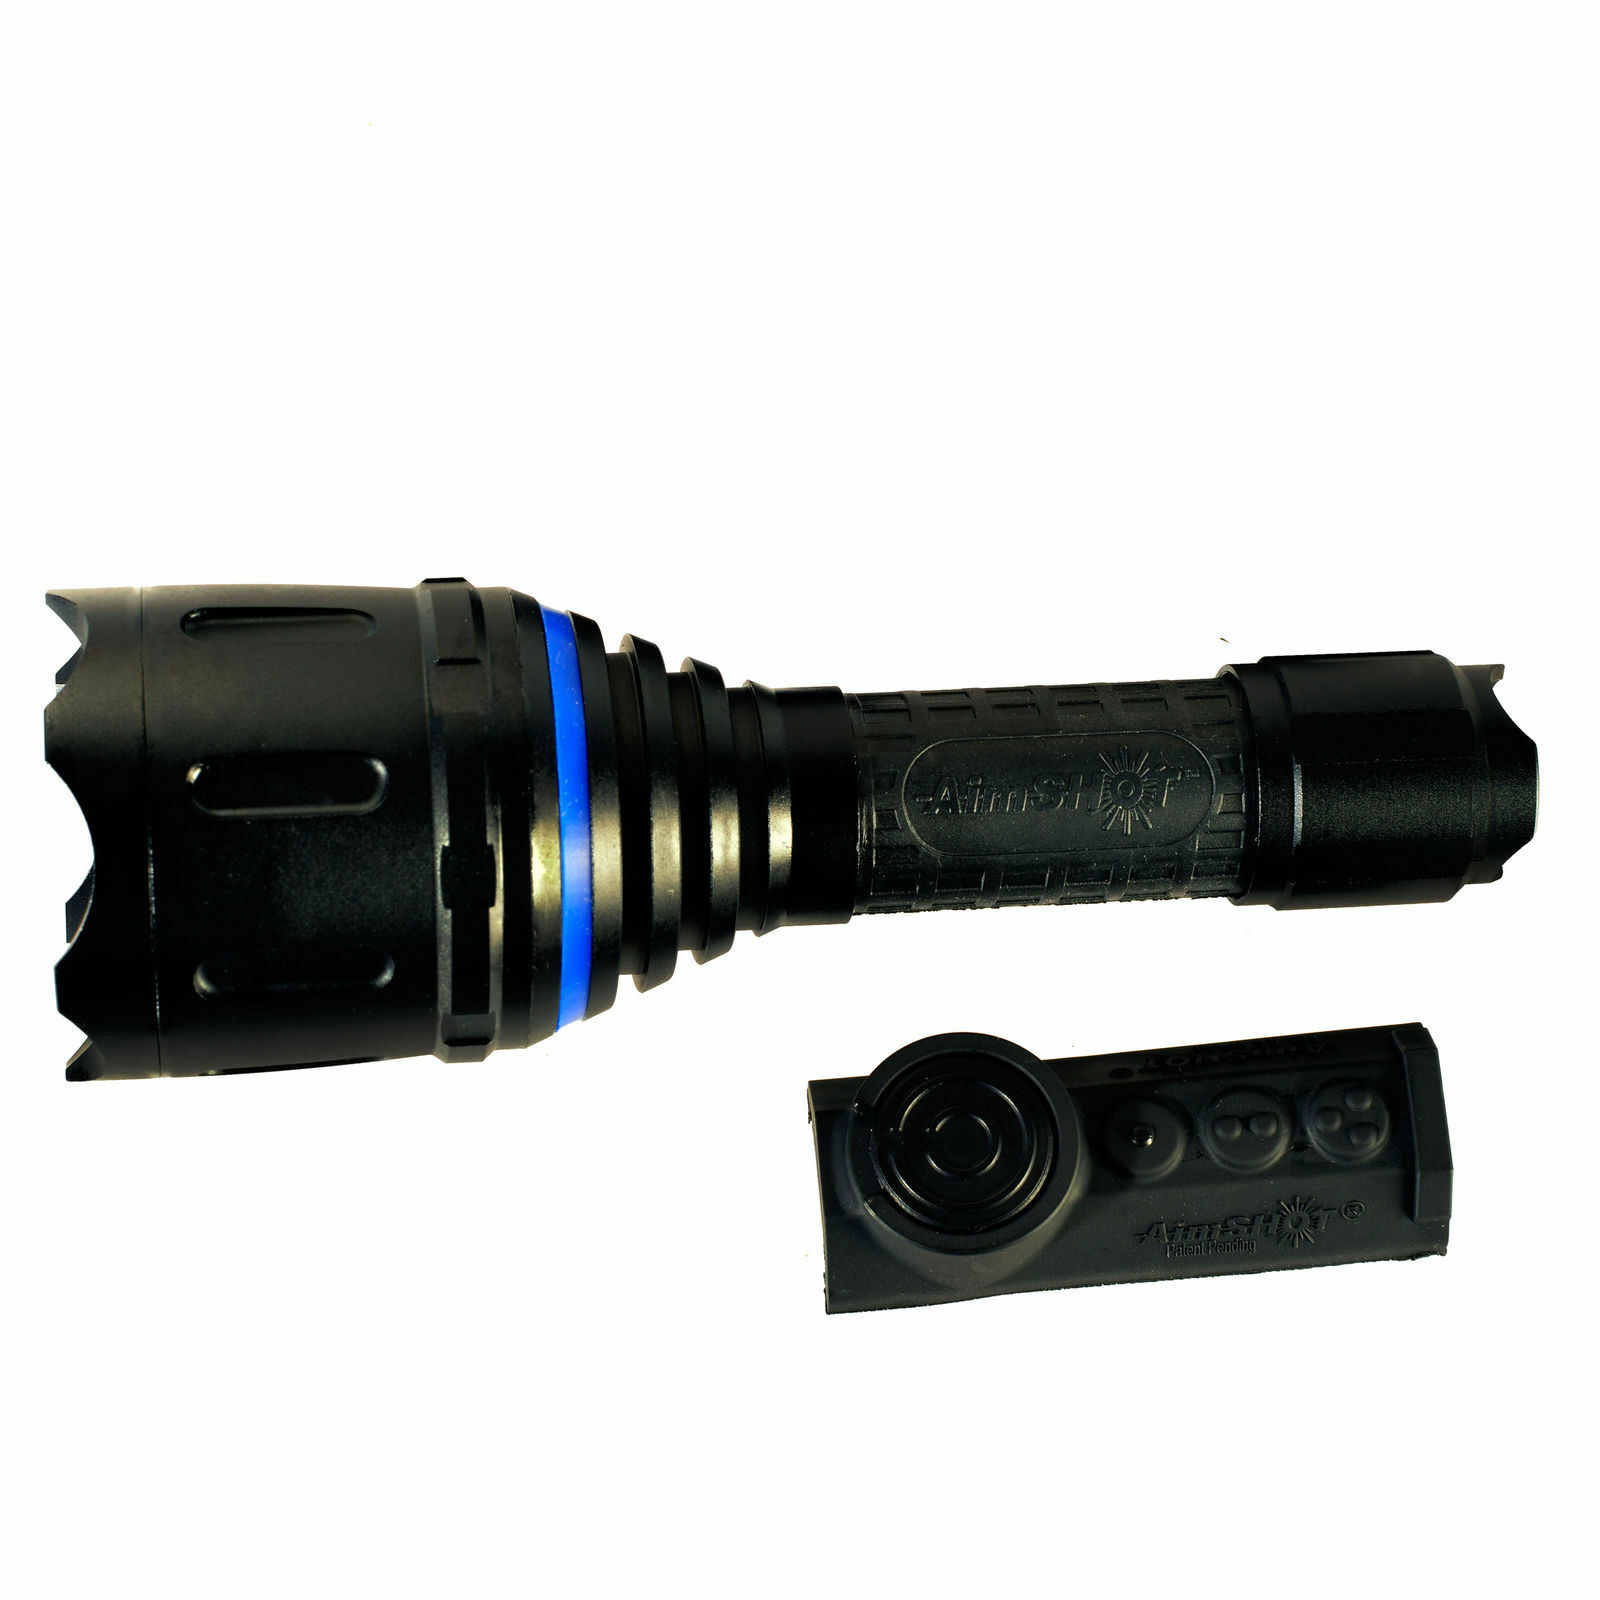 AimShot, TZ-980-WH LED LIGHT, Wireless Pressure Switch, Waterproof, NEW